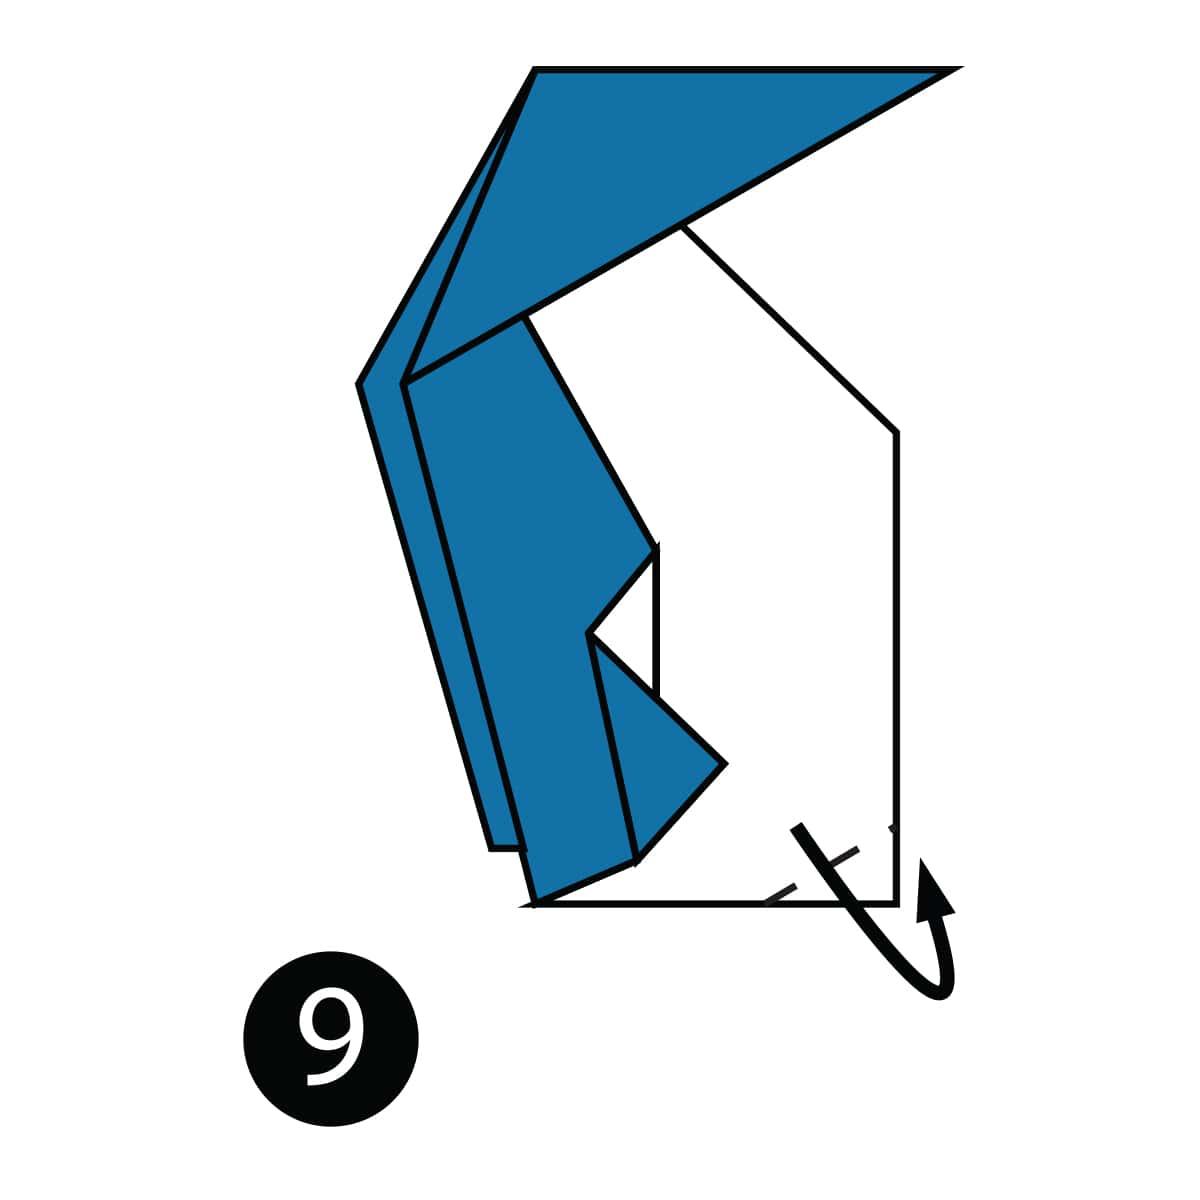 Penguin Step 9